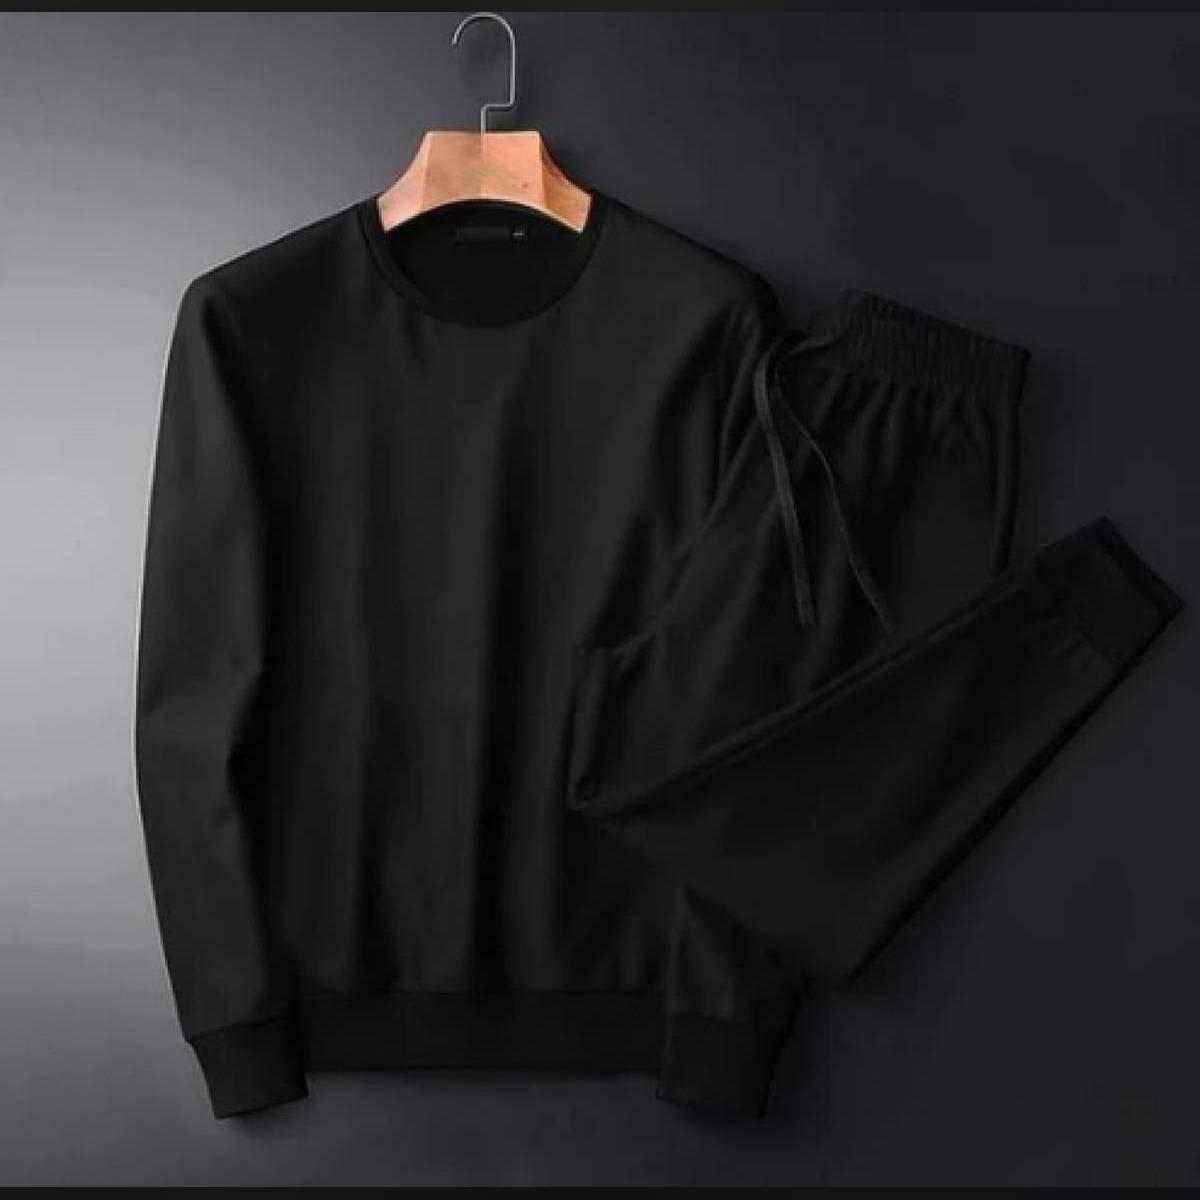 Plain Trending Track Suite For Men's Shirt and Trouser